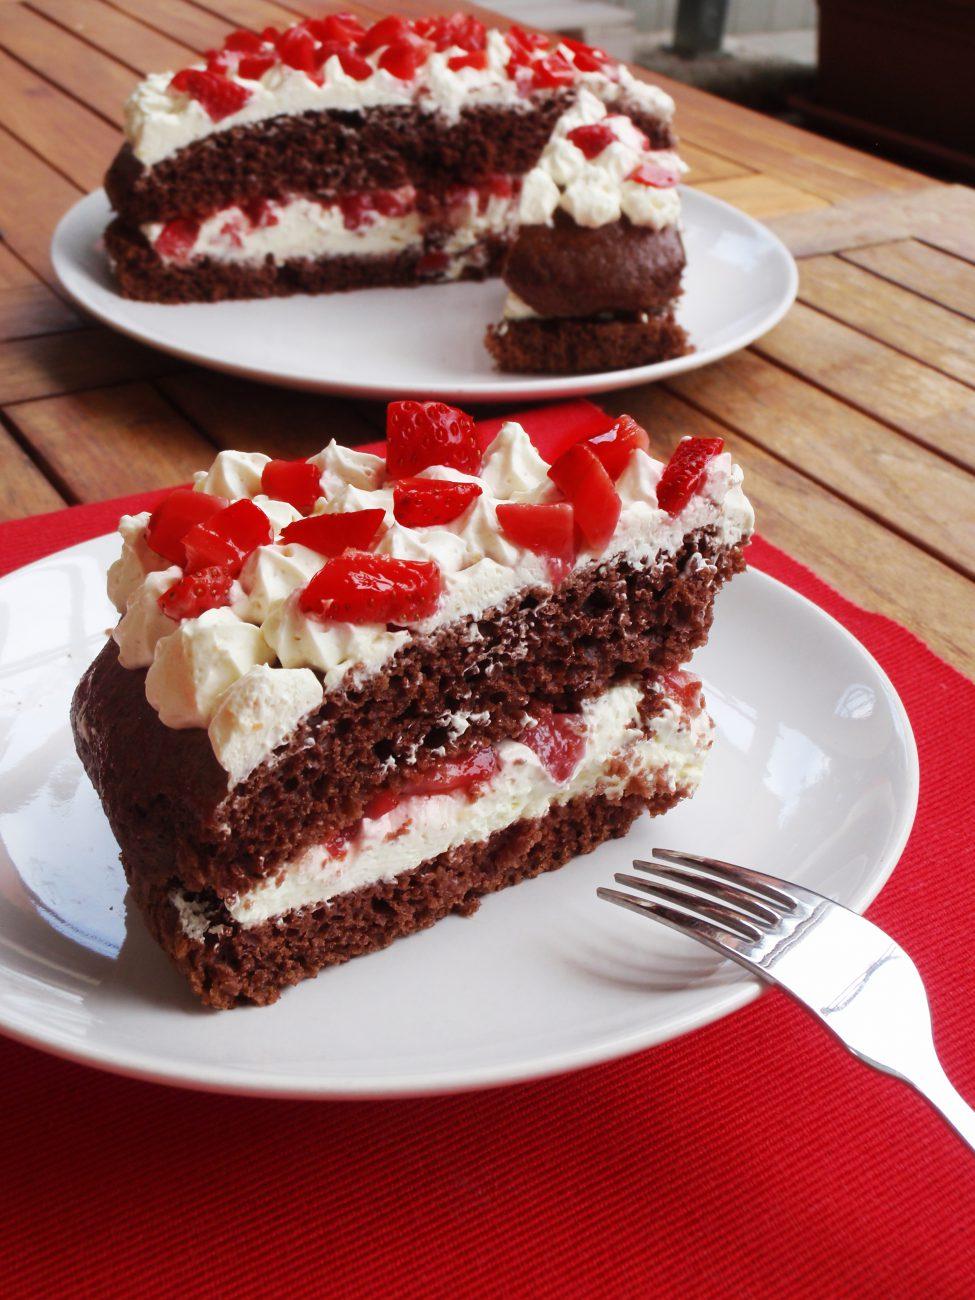 Sponge Cake al Cacao, Fragole e Chantilly